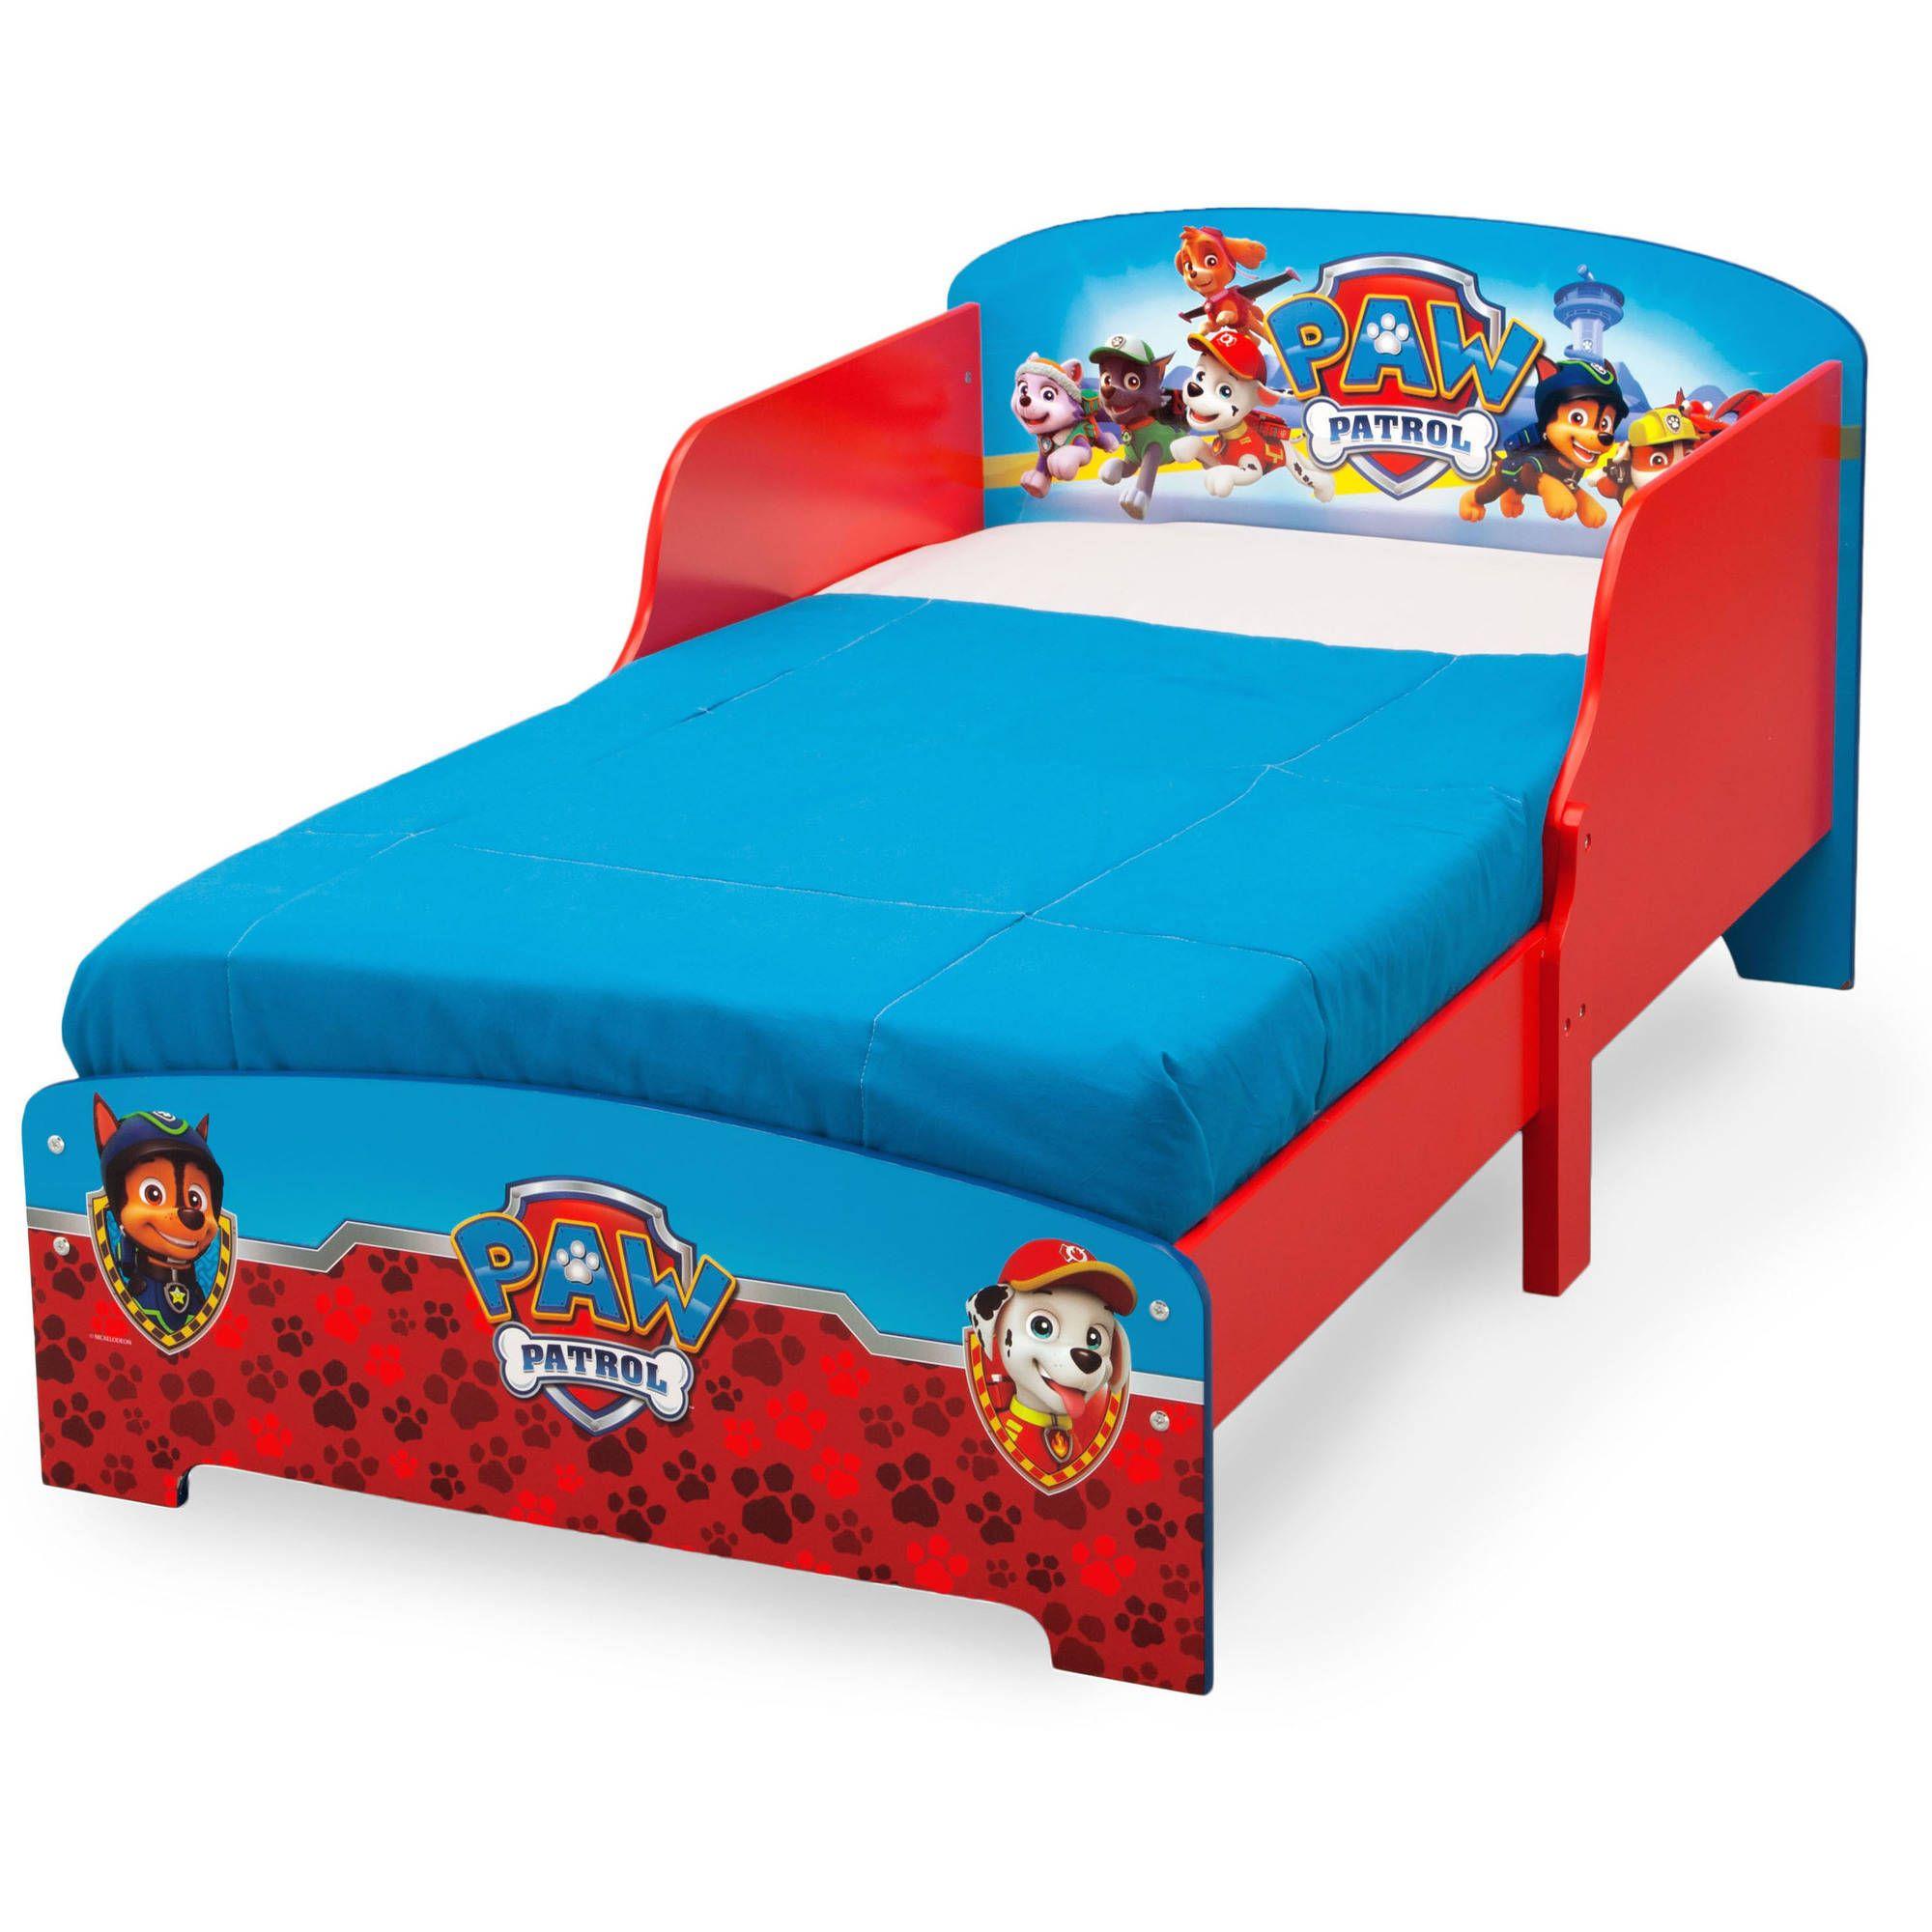 Delta Children Nick Jr Paw Patrol Wooden Toddler Bed Red